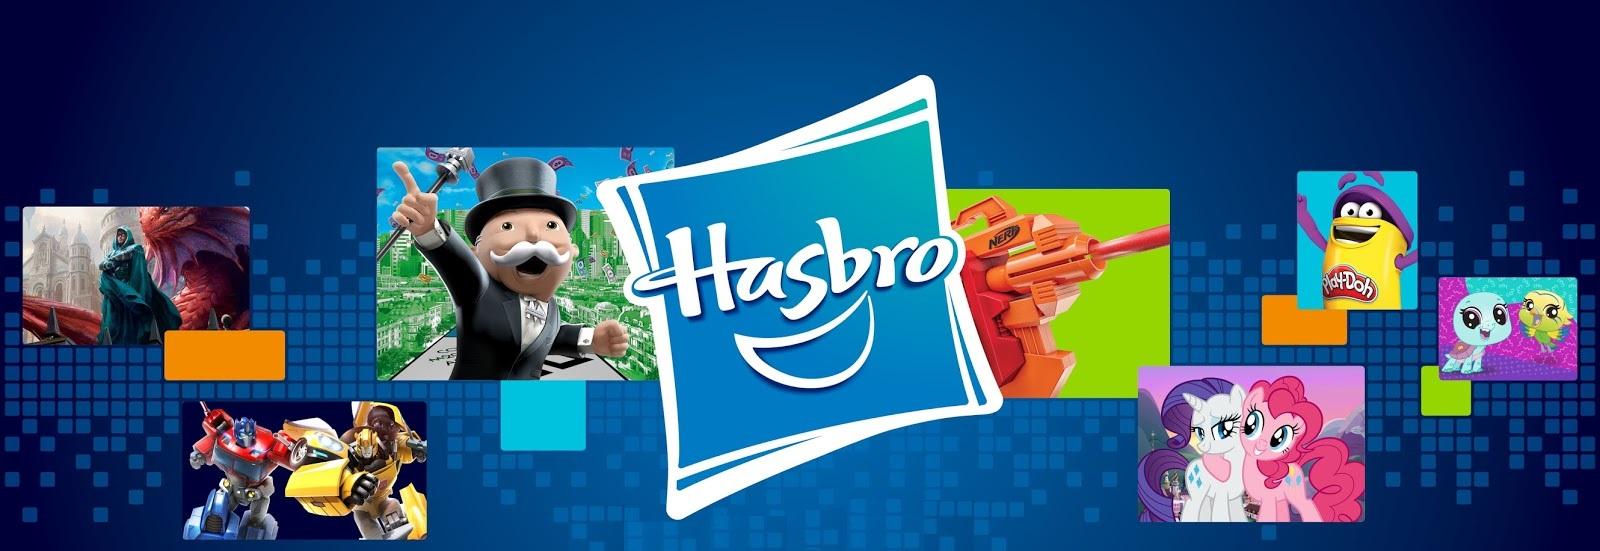 Hasbro Monopoly For Millennials Board Game | Buy Online | Ubuy Kuwait